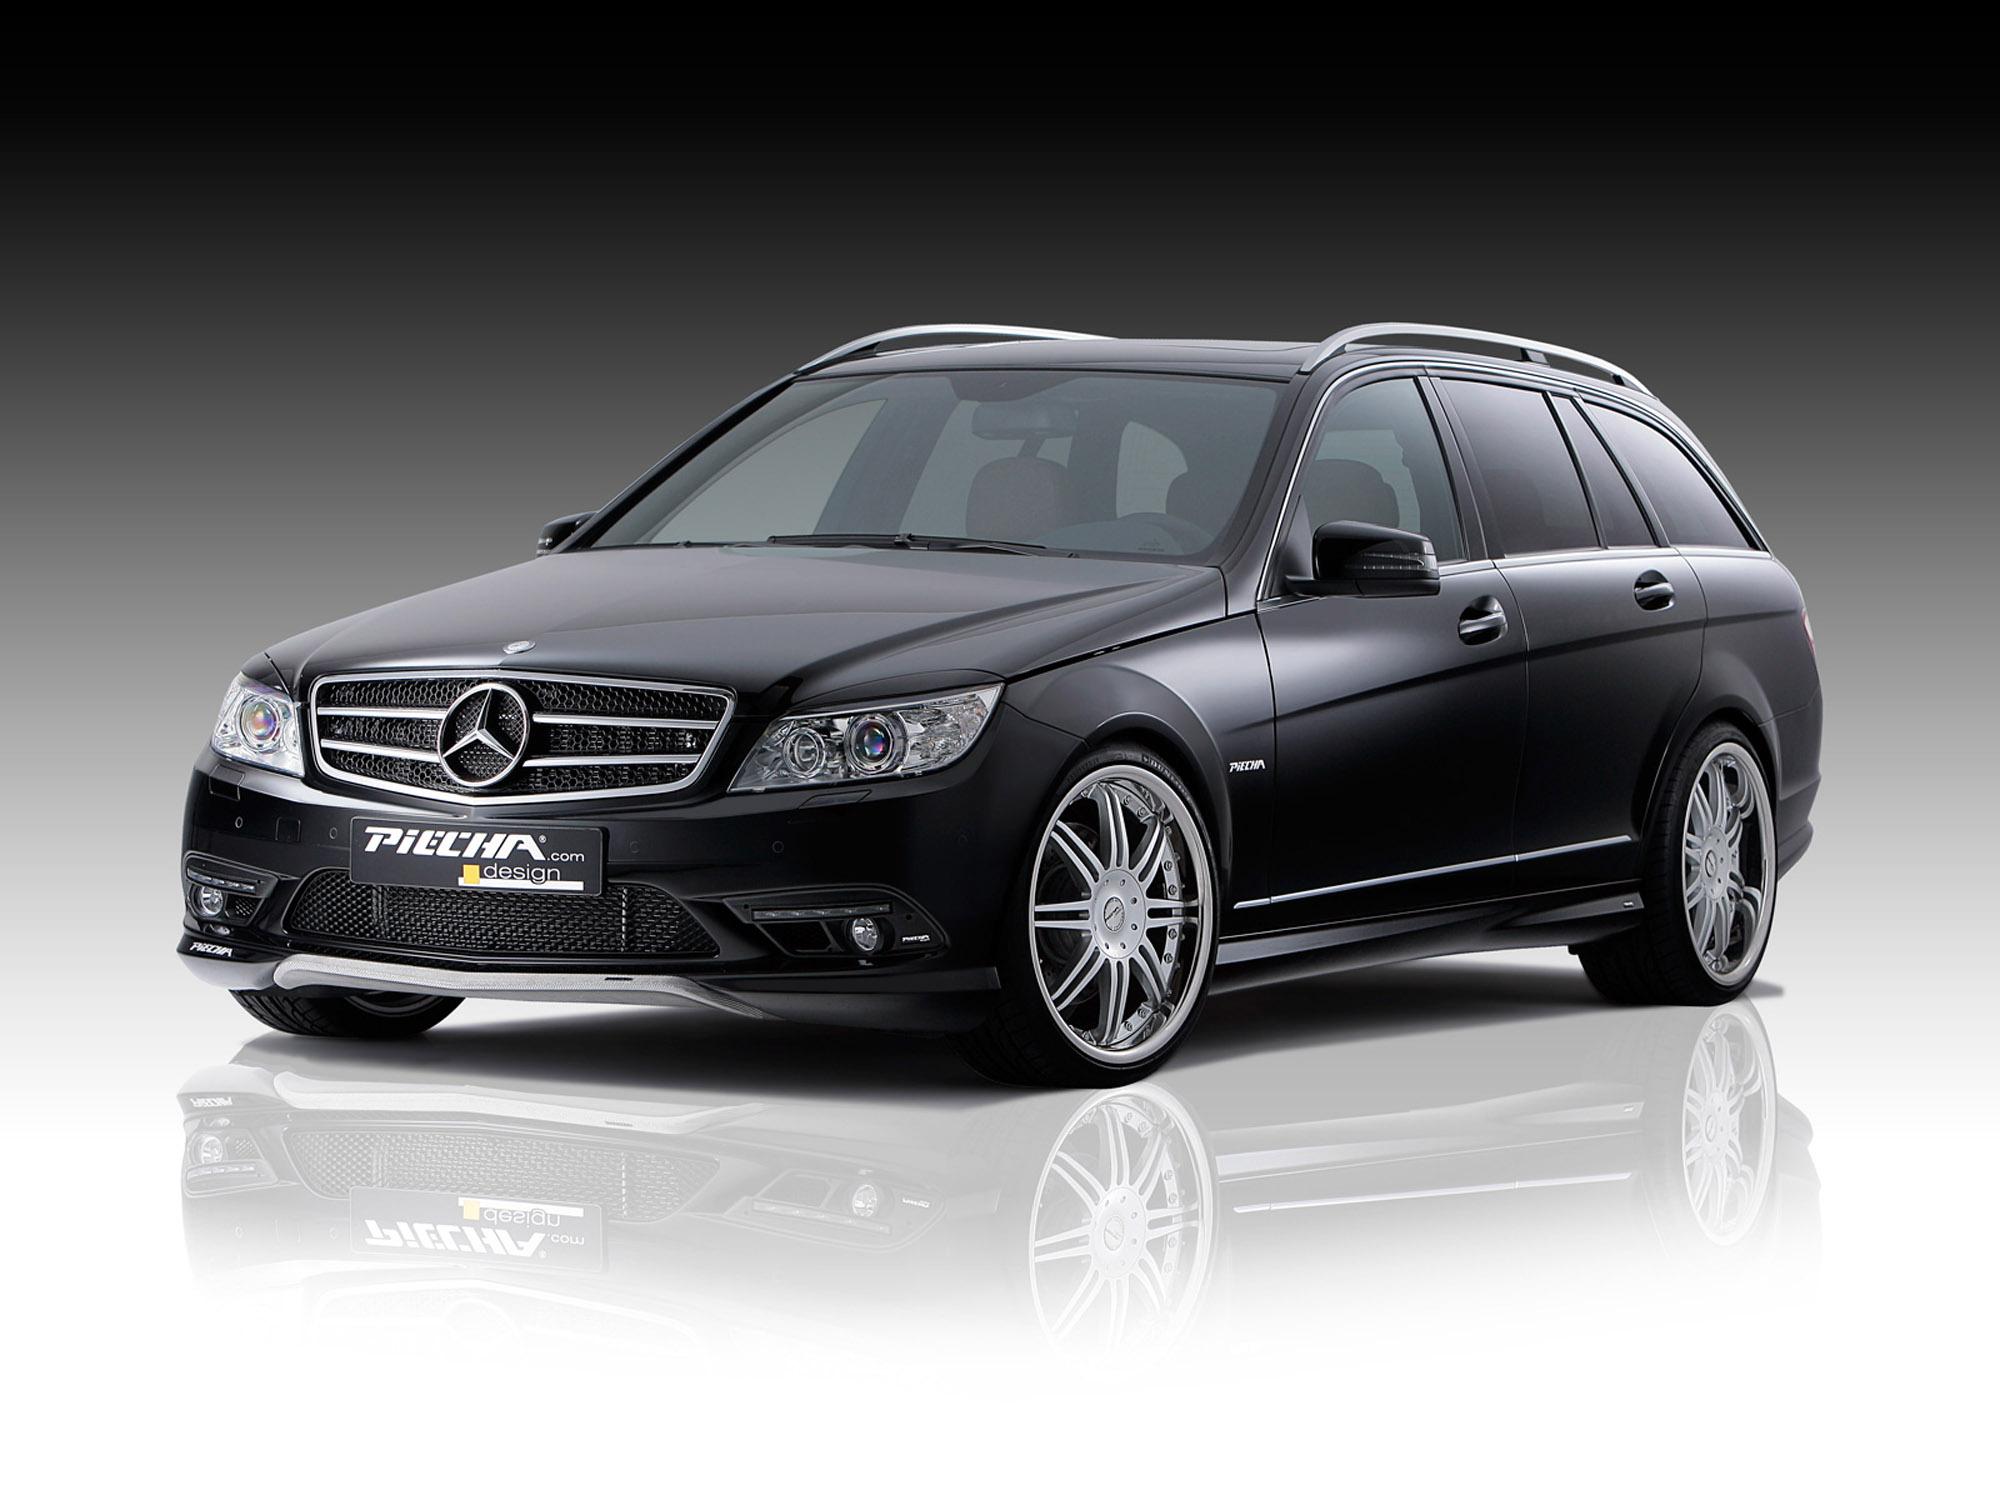 Piecha design refines the mercedes benz c class estate for Mercedes benz design